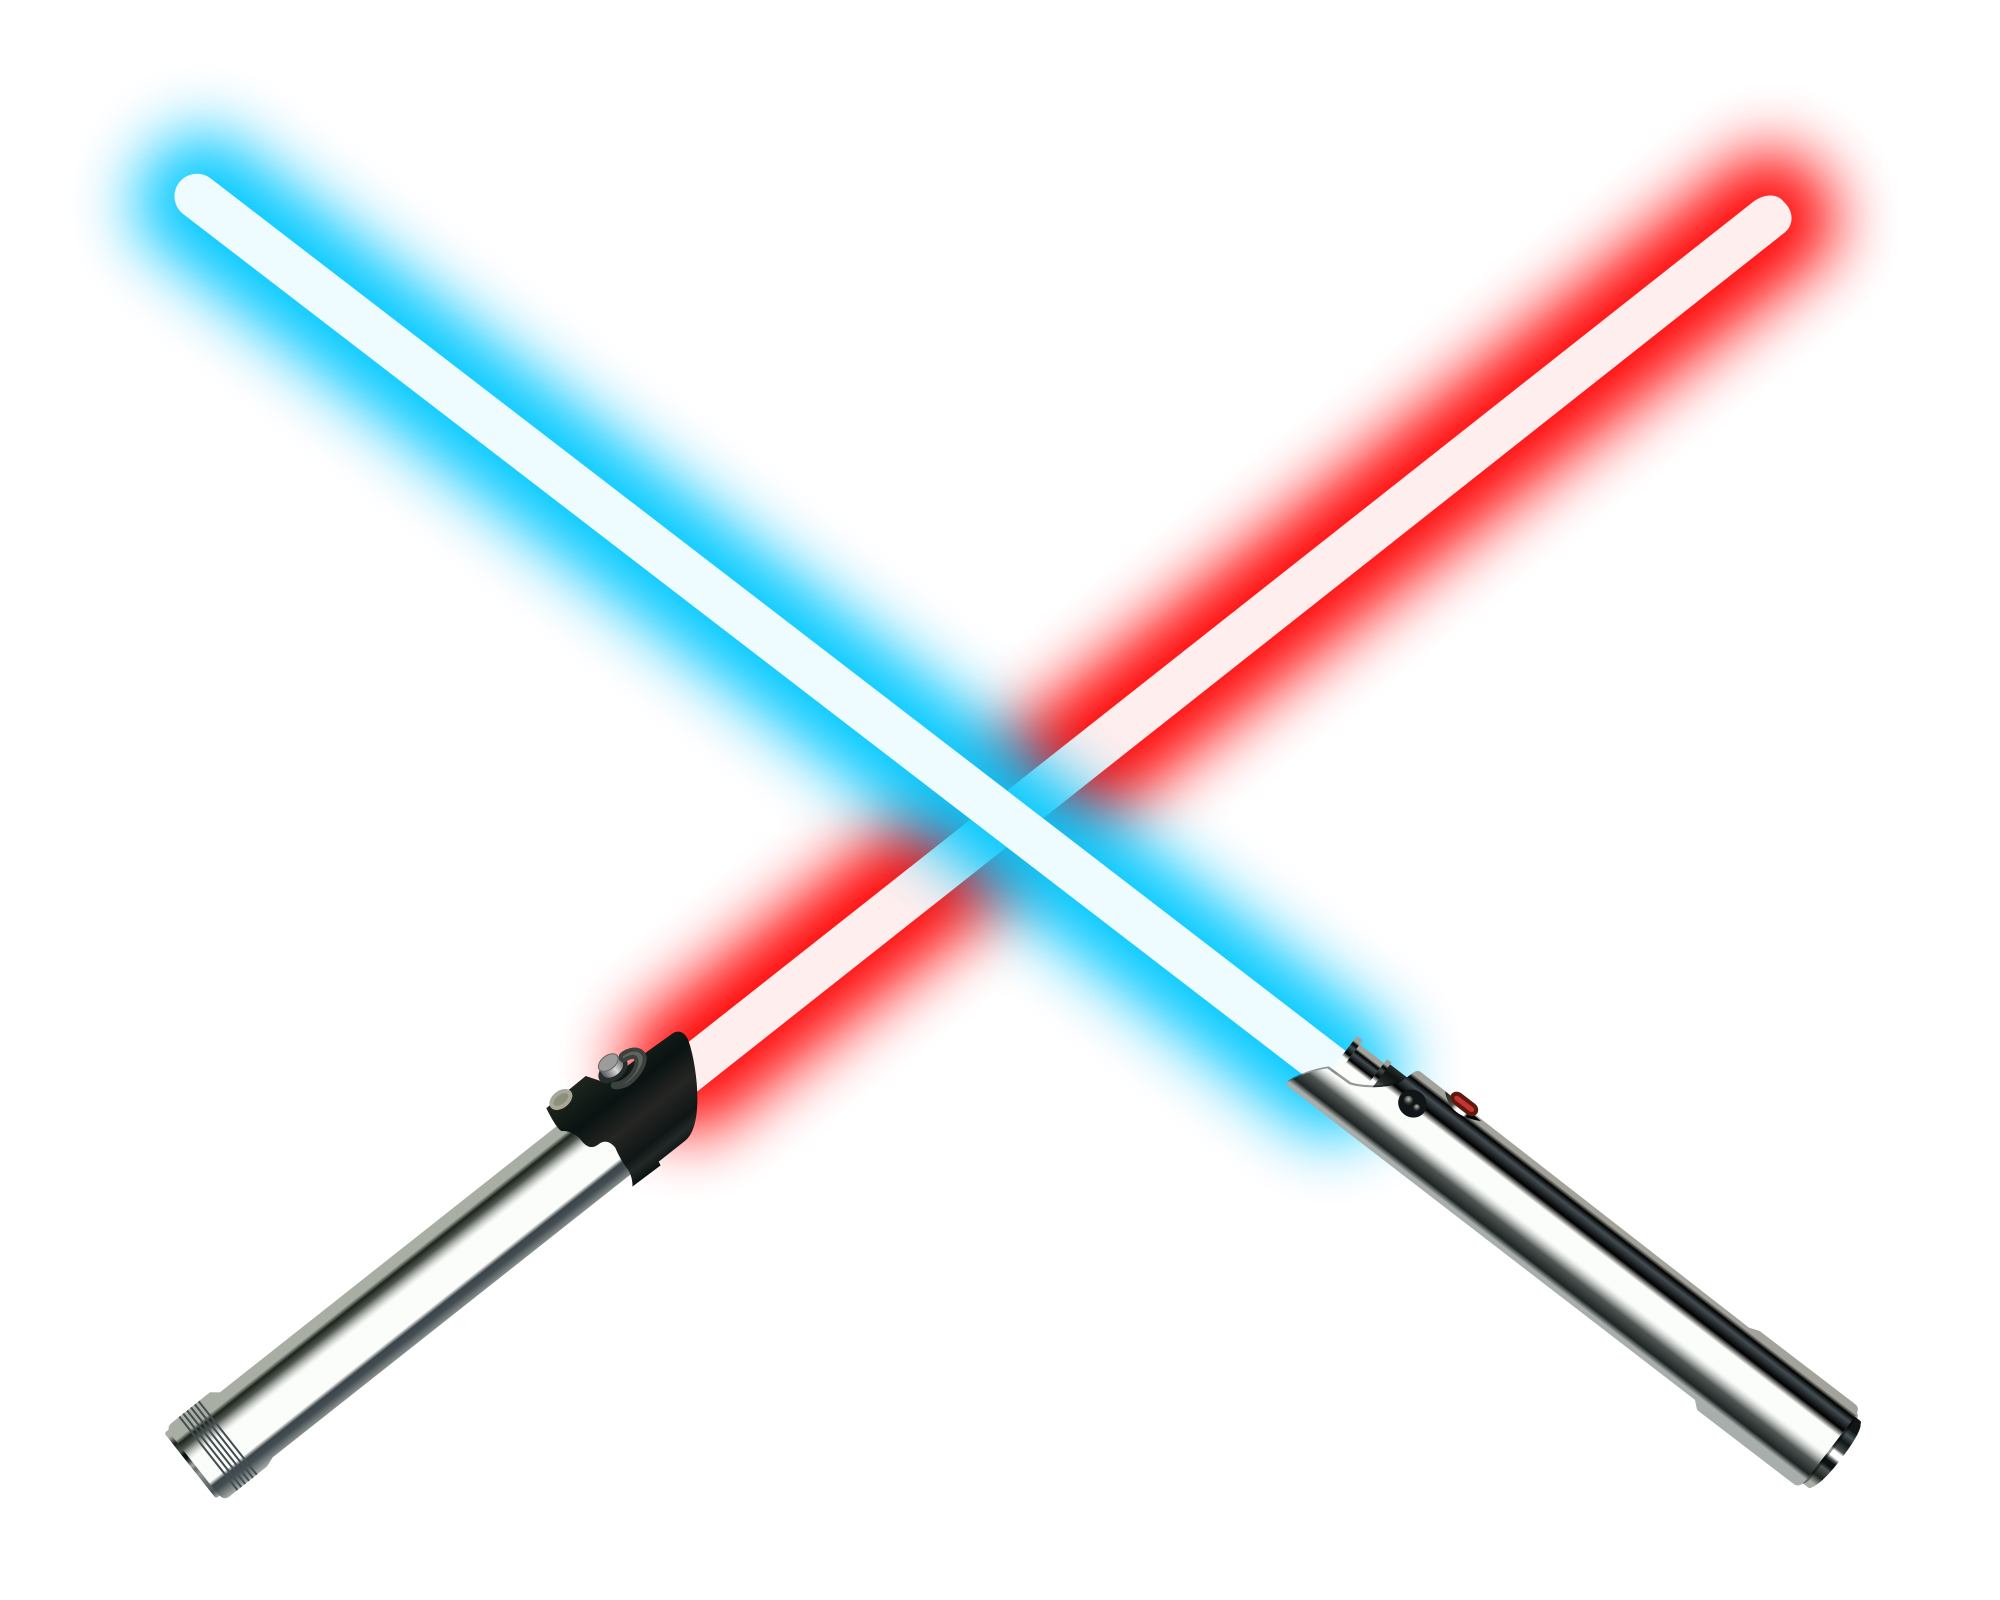 Star wars gun clipart clip Clip Art Star Wars Lightsabers Blasters Real Clipart M4lpnfc clip